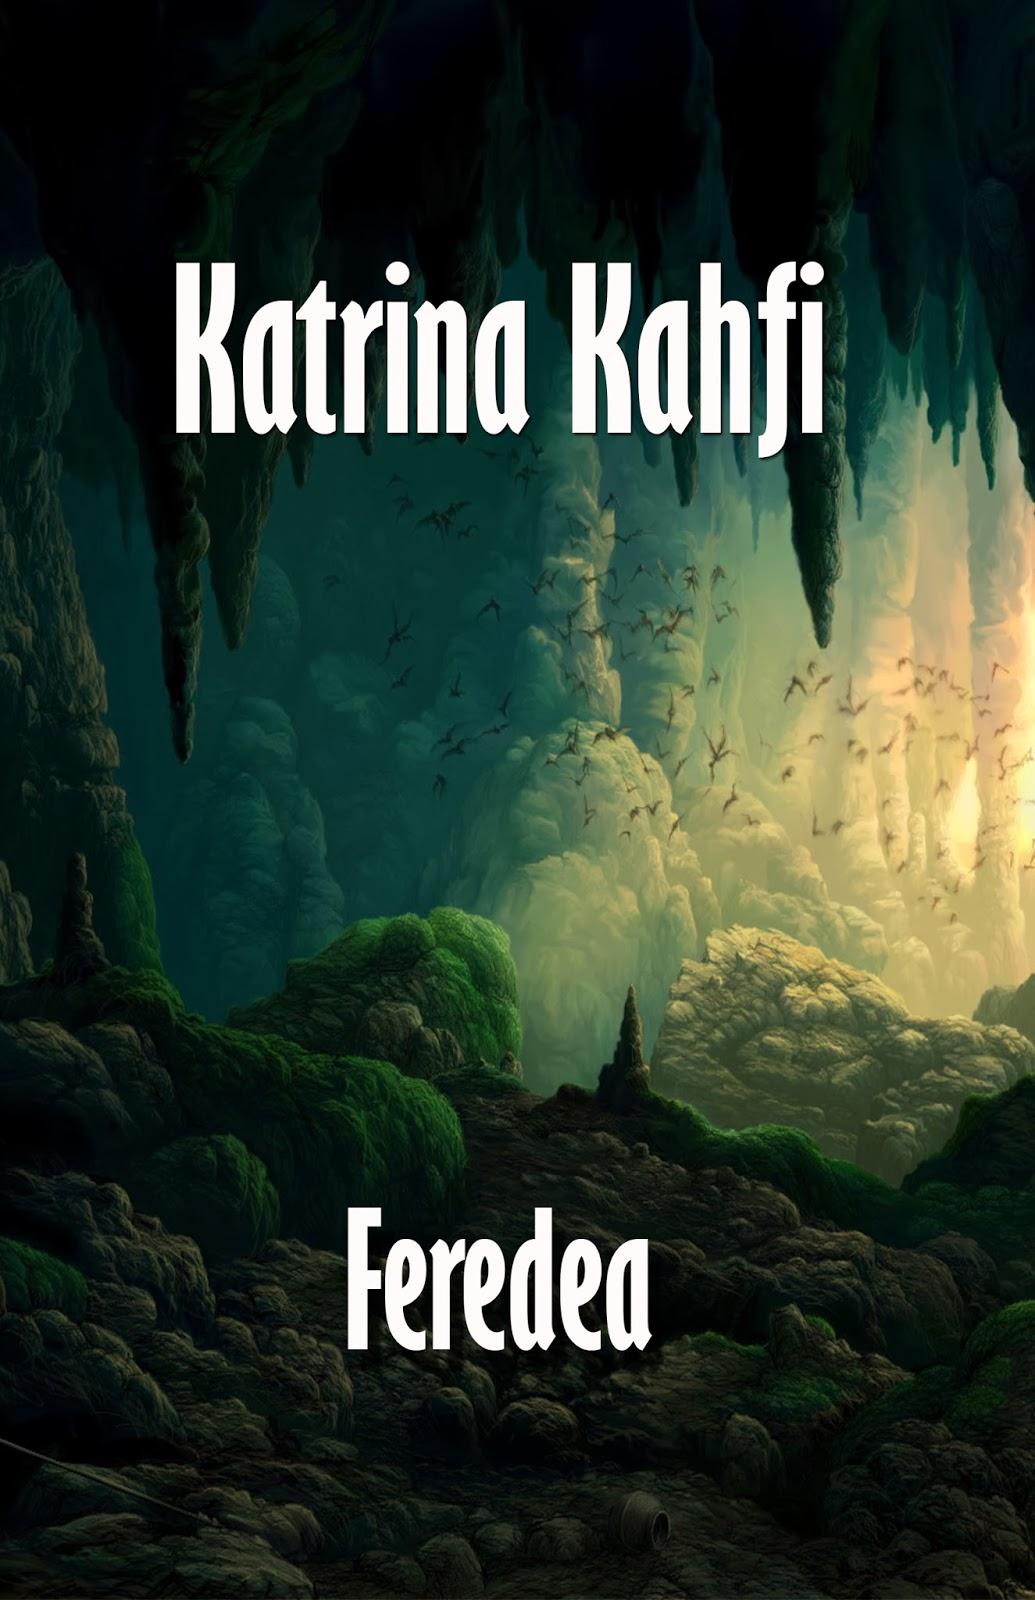 https://play.google.com/store/books/details/Feredea_Katrina_Kahfi?id=HFLLAgAAQBAJ